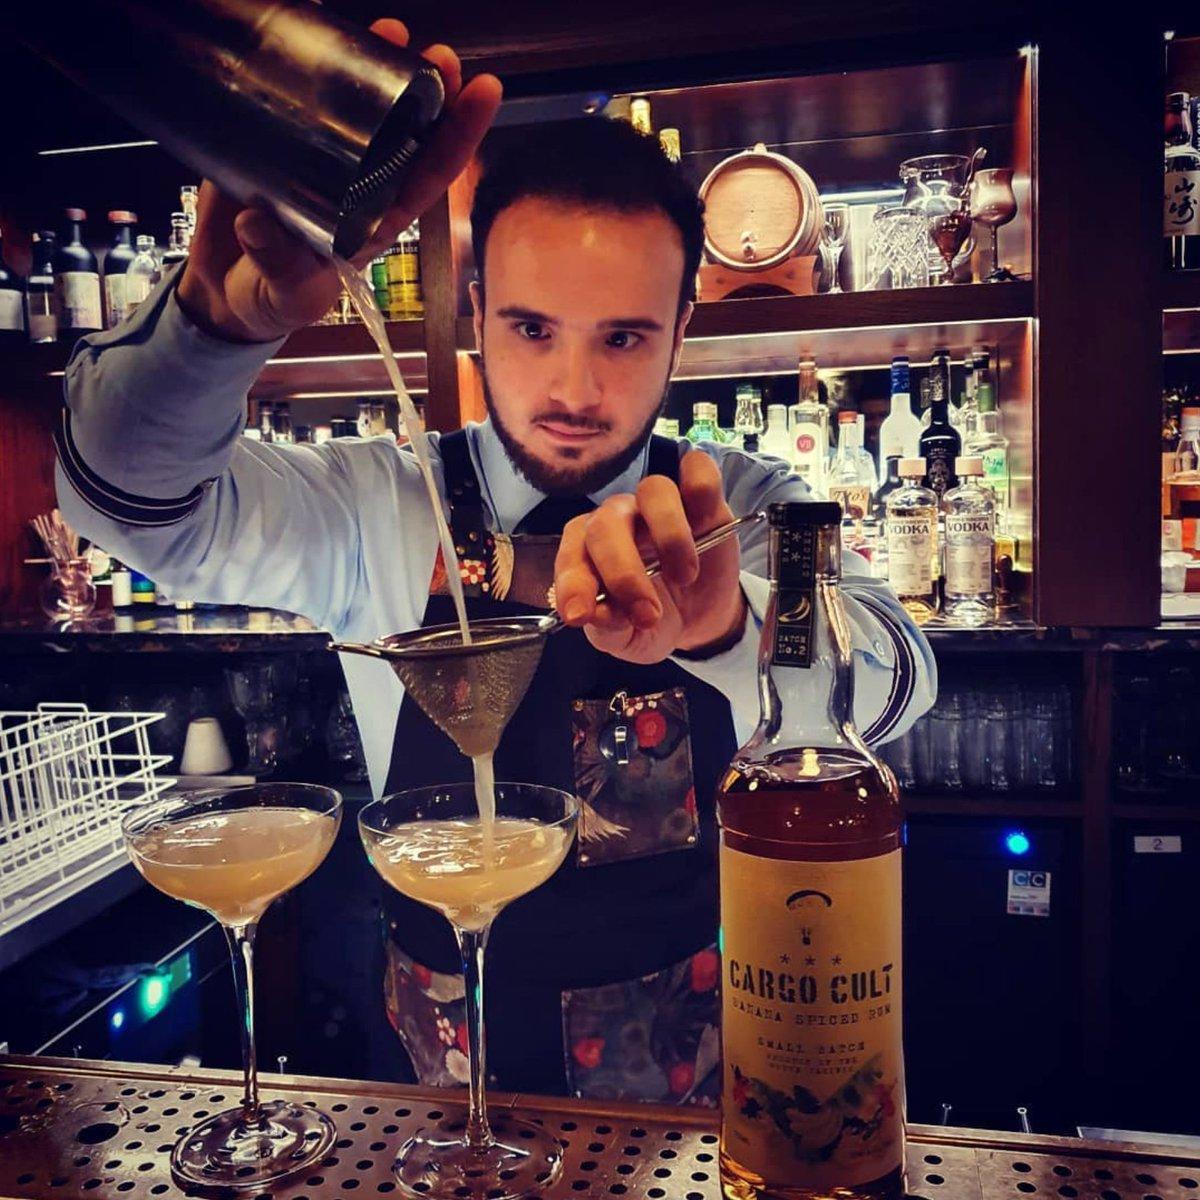 @vintryandmercer boys getting Mixological! Cargo Cult Spiced Rum banana Daiquiris all around! @mario_indiebrands  #repost #tribeofindie #mixolology #vintryandmercer #cocktails #gobananas #banana #bananarum #spicedrum #infused #southpacific #goape #southpacific #craft #rum